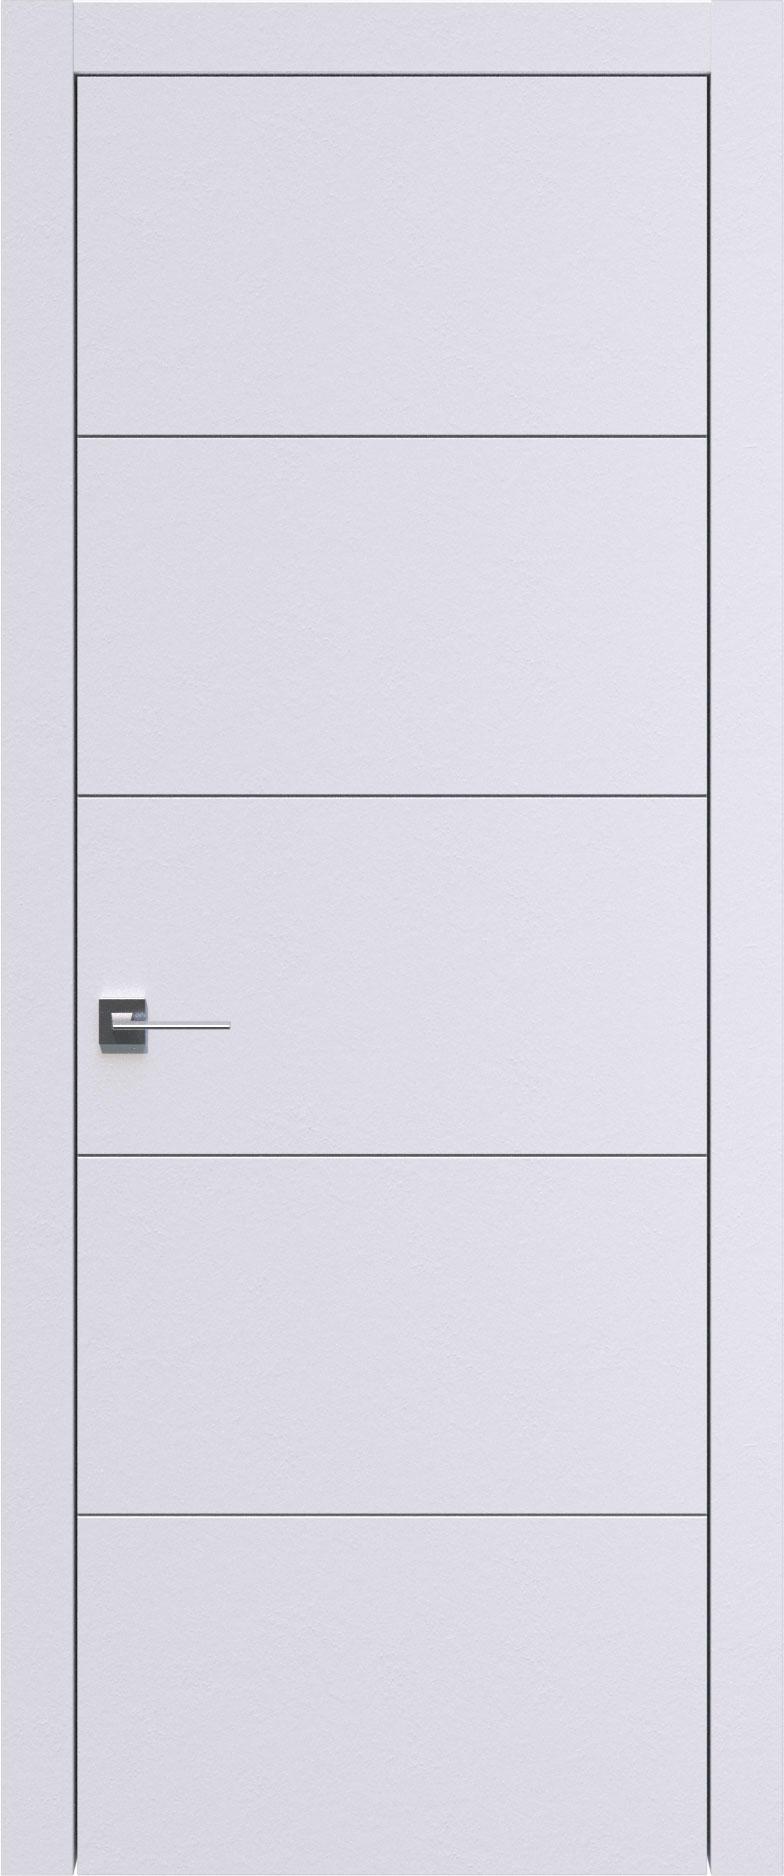 Tivoli Д-3 цвет - Арктик белый Без стекла (ДГ)